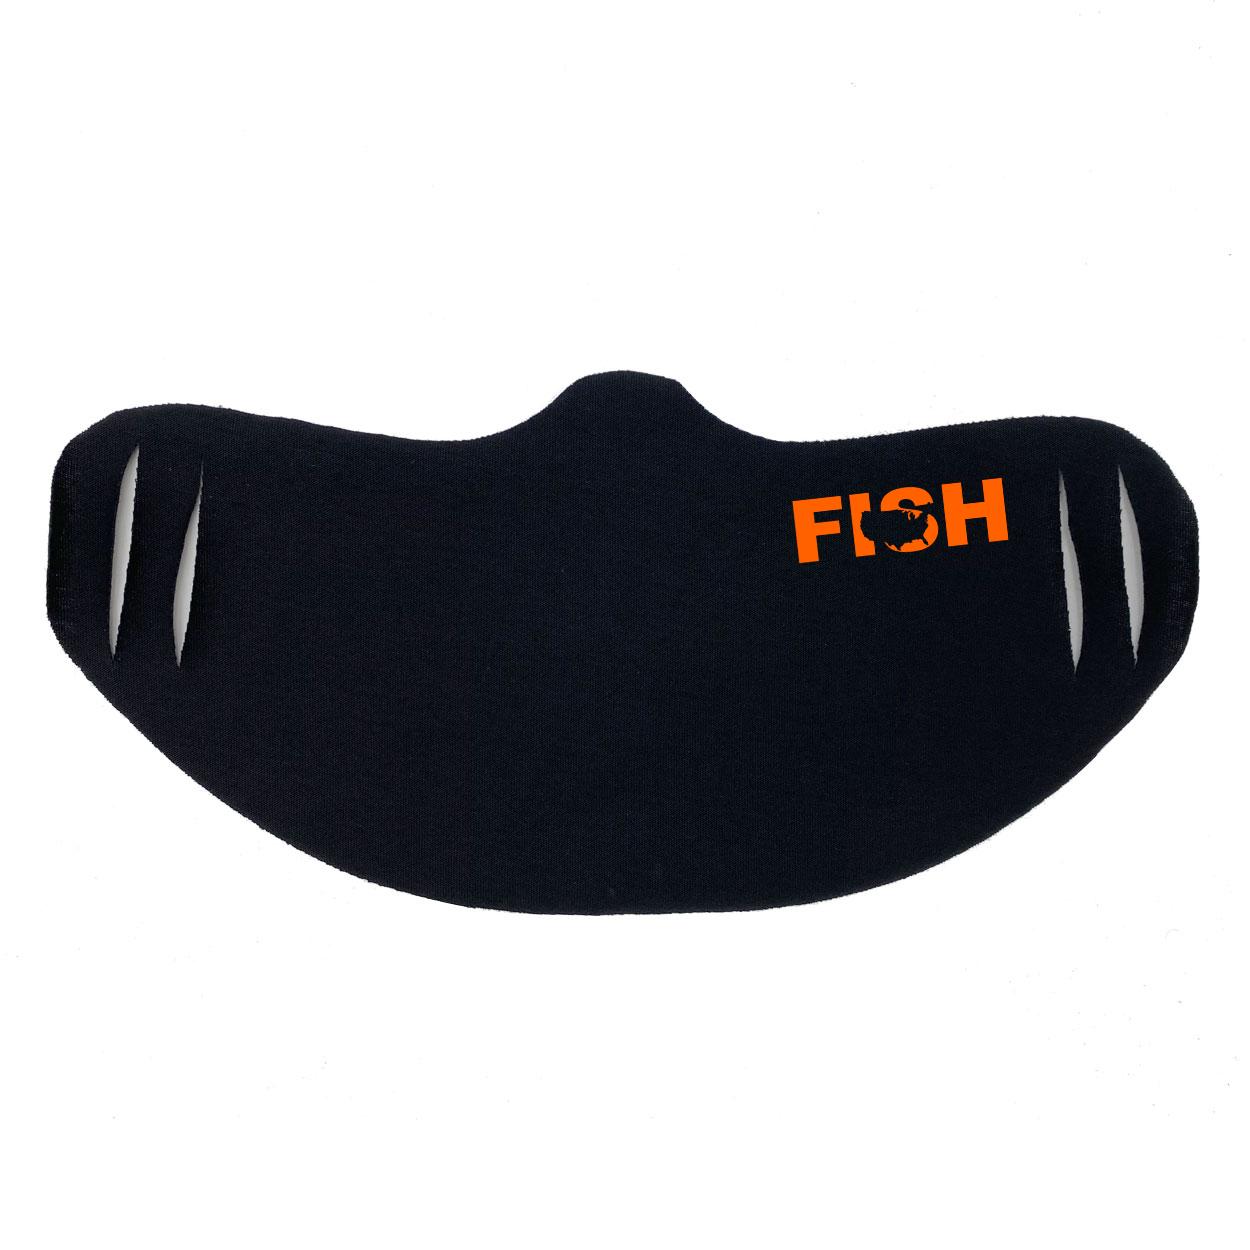 Fish United States Ultra Lightweight Face Mask Cover Black (Orange Logo)